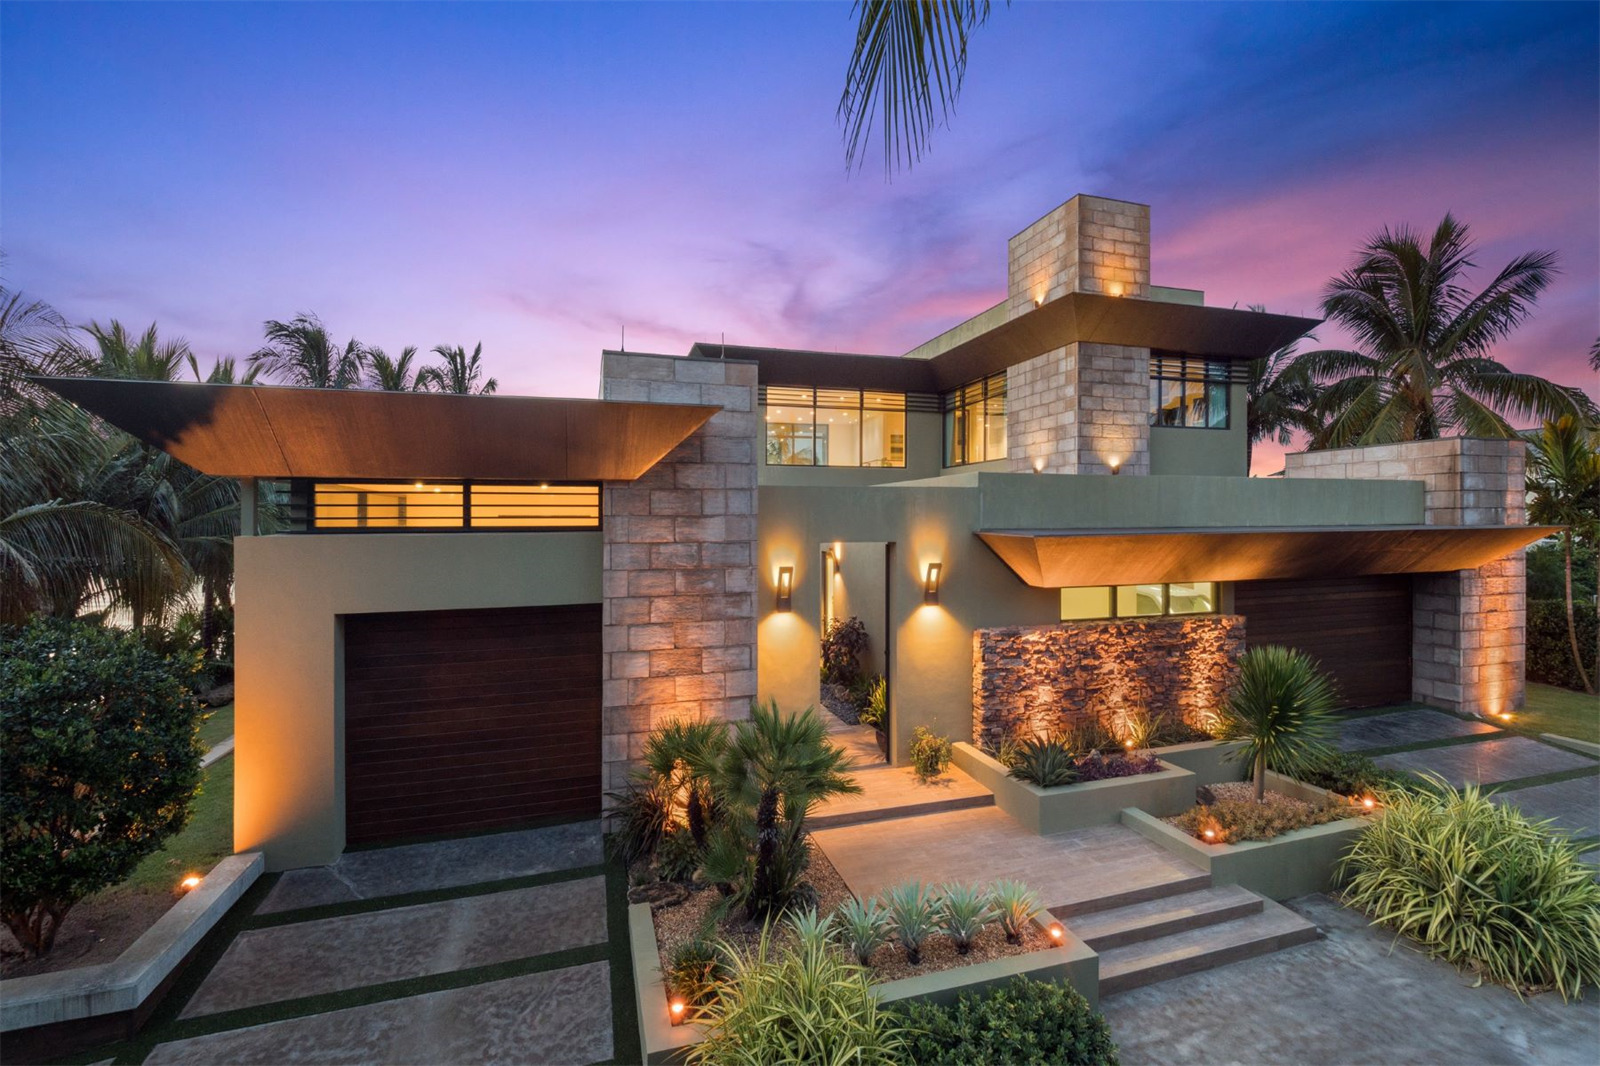 Frank Lloyd Wright Inspired Home In Jupiter Asks 12m